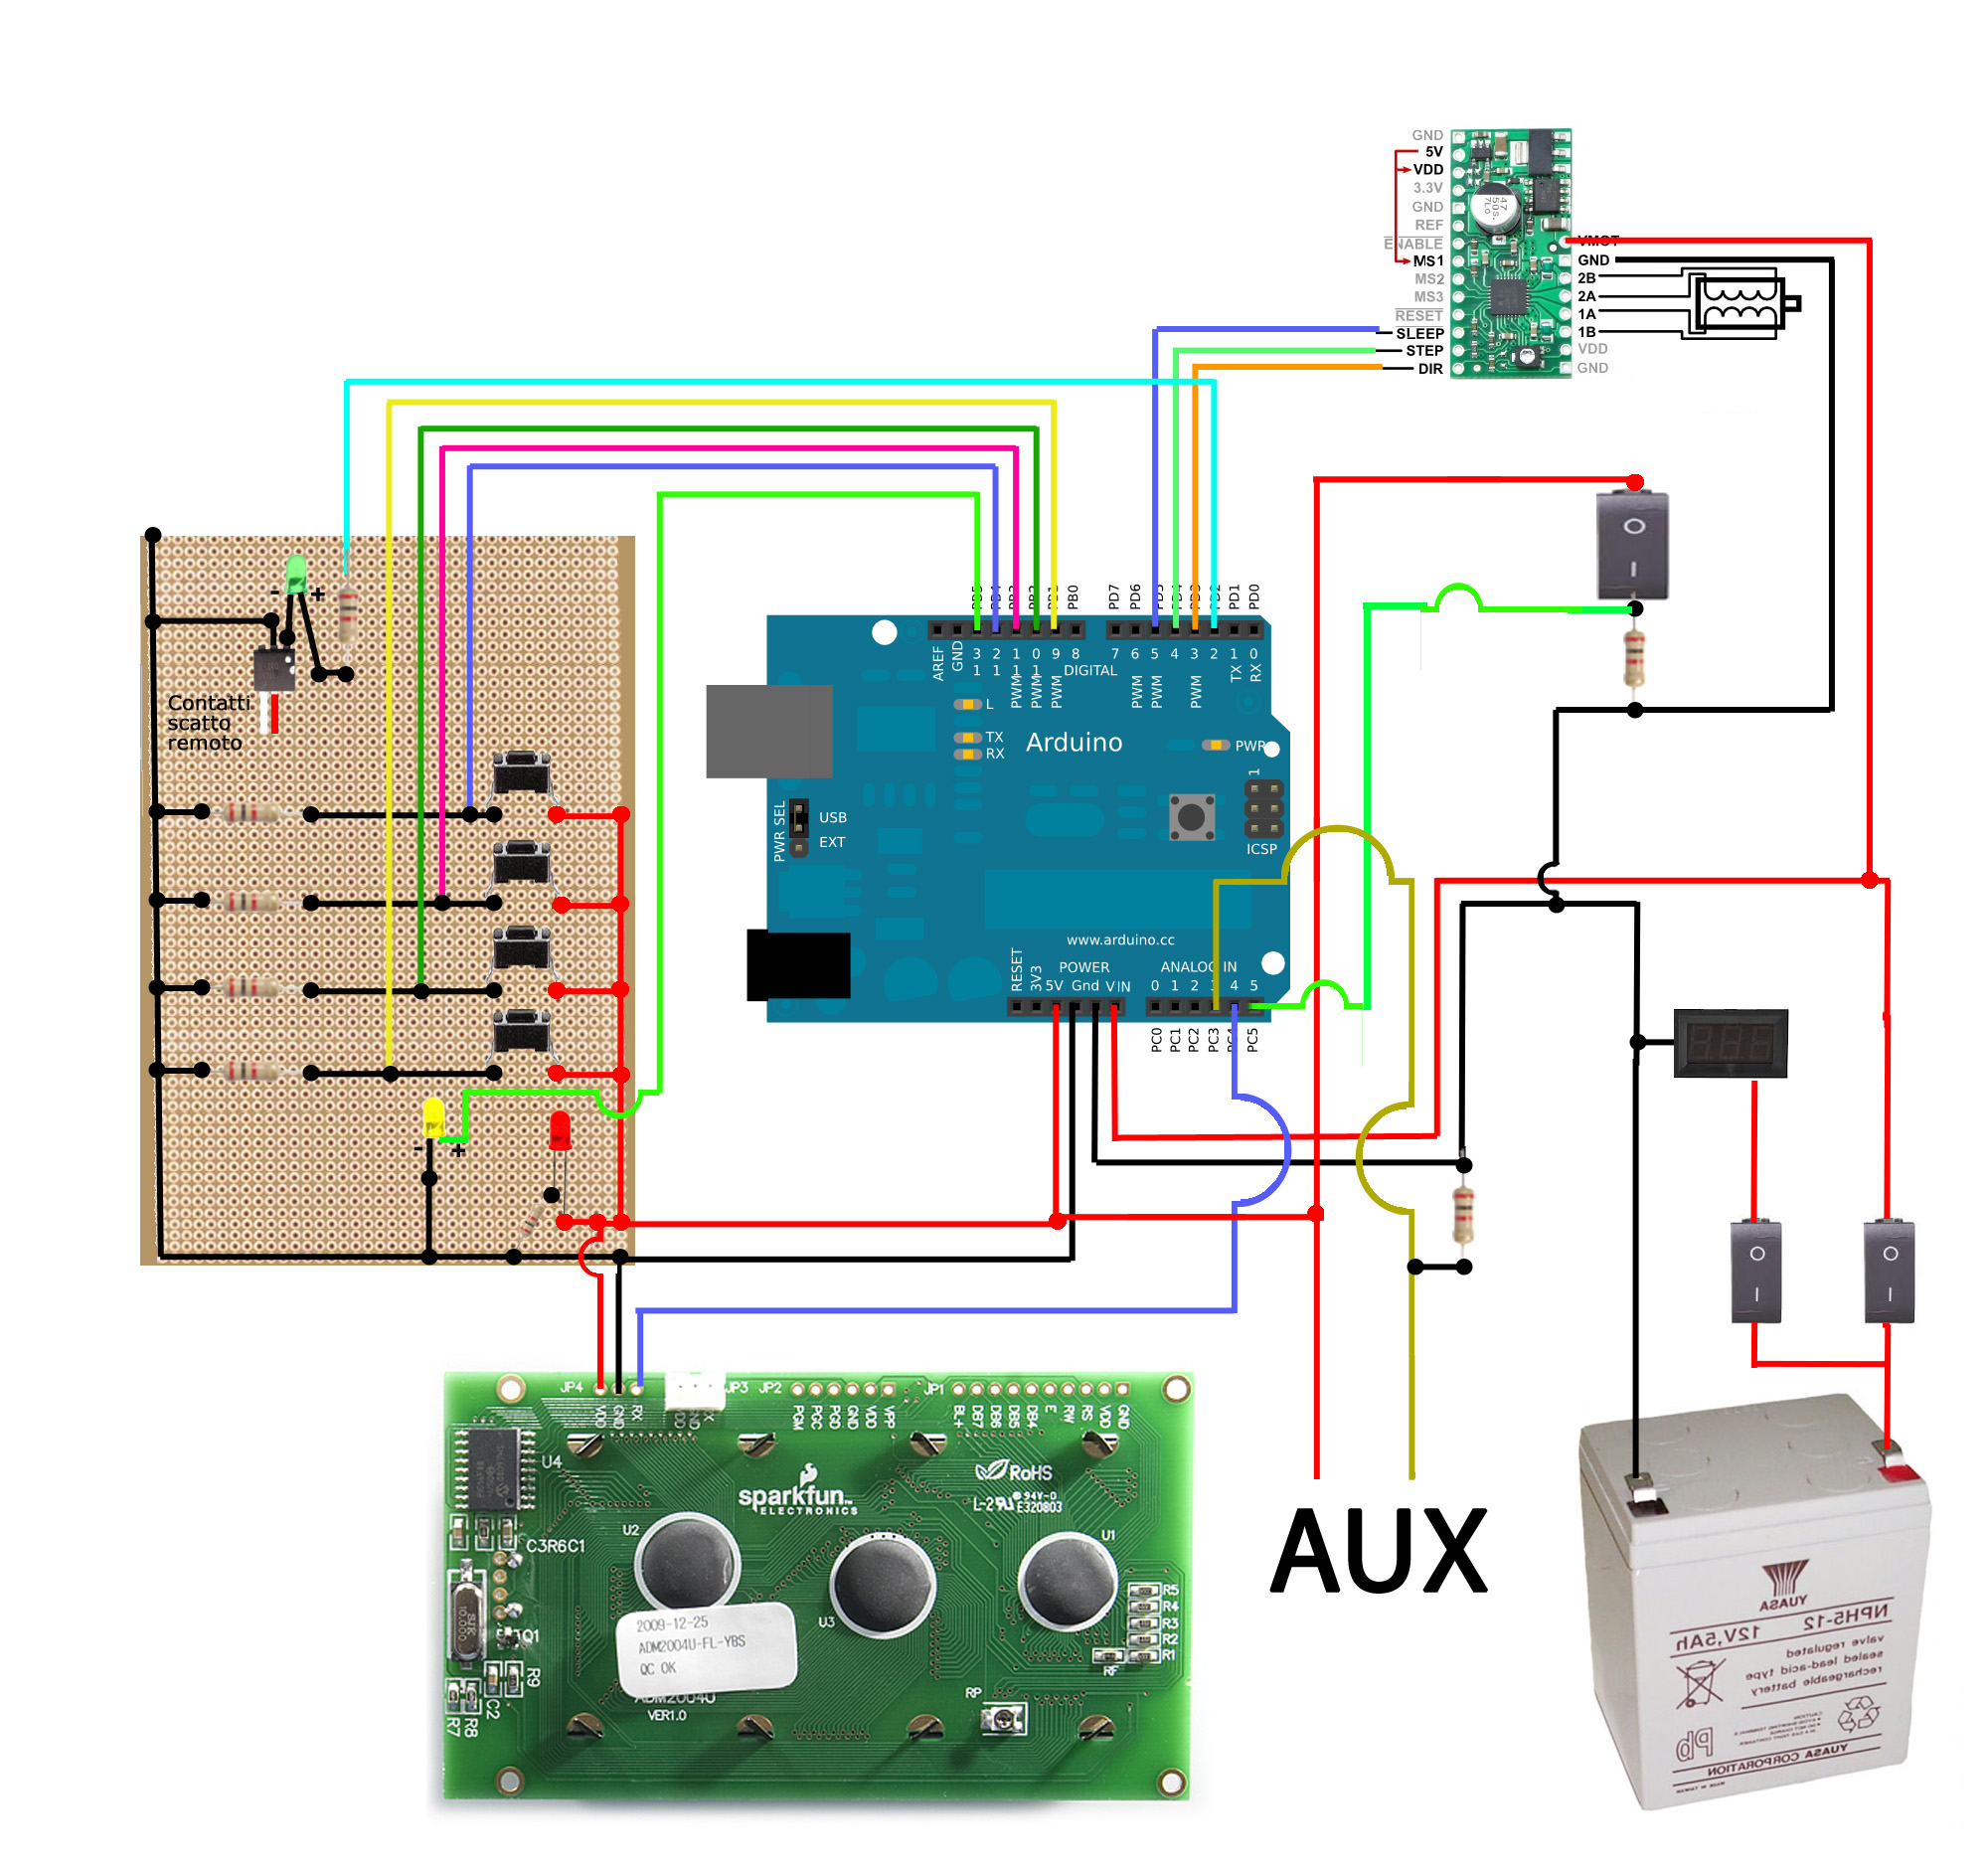 Schema Elettrico Per Wilayah : Schema elettrico software e hardware per timelapser